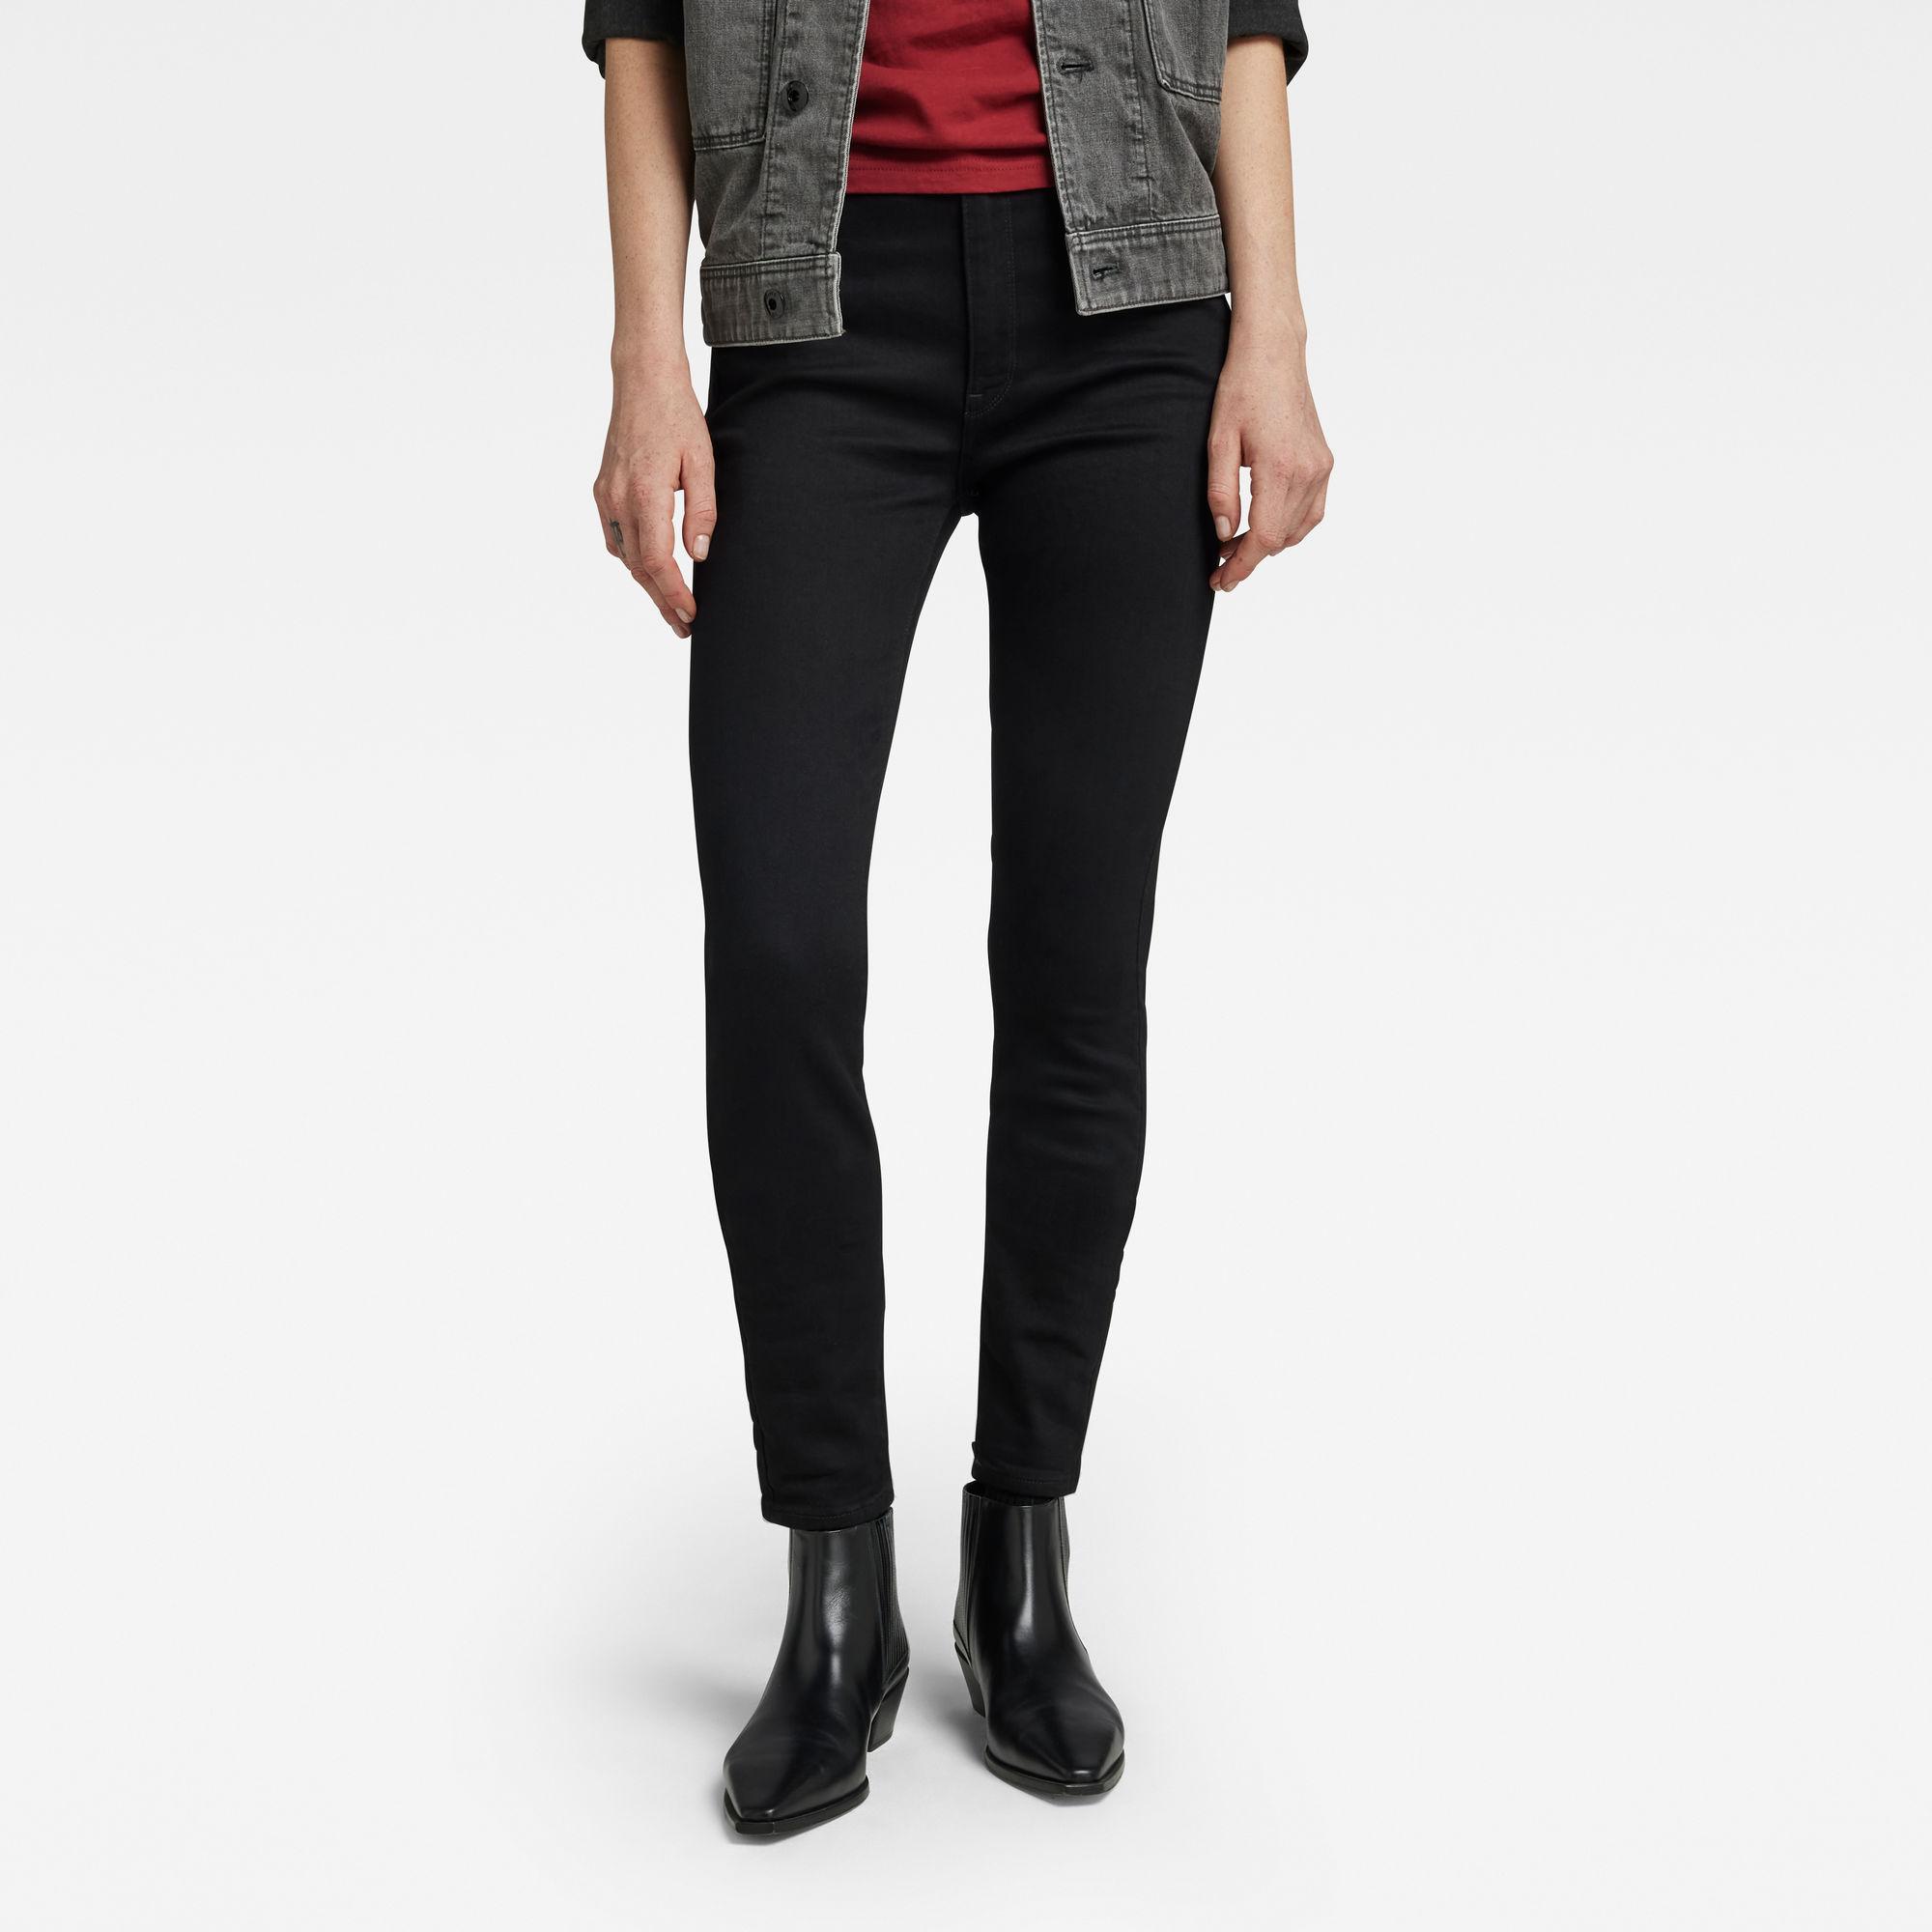 G-Star RAW Dames Kafey Ultra High Skinny Jeans Zwart